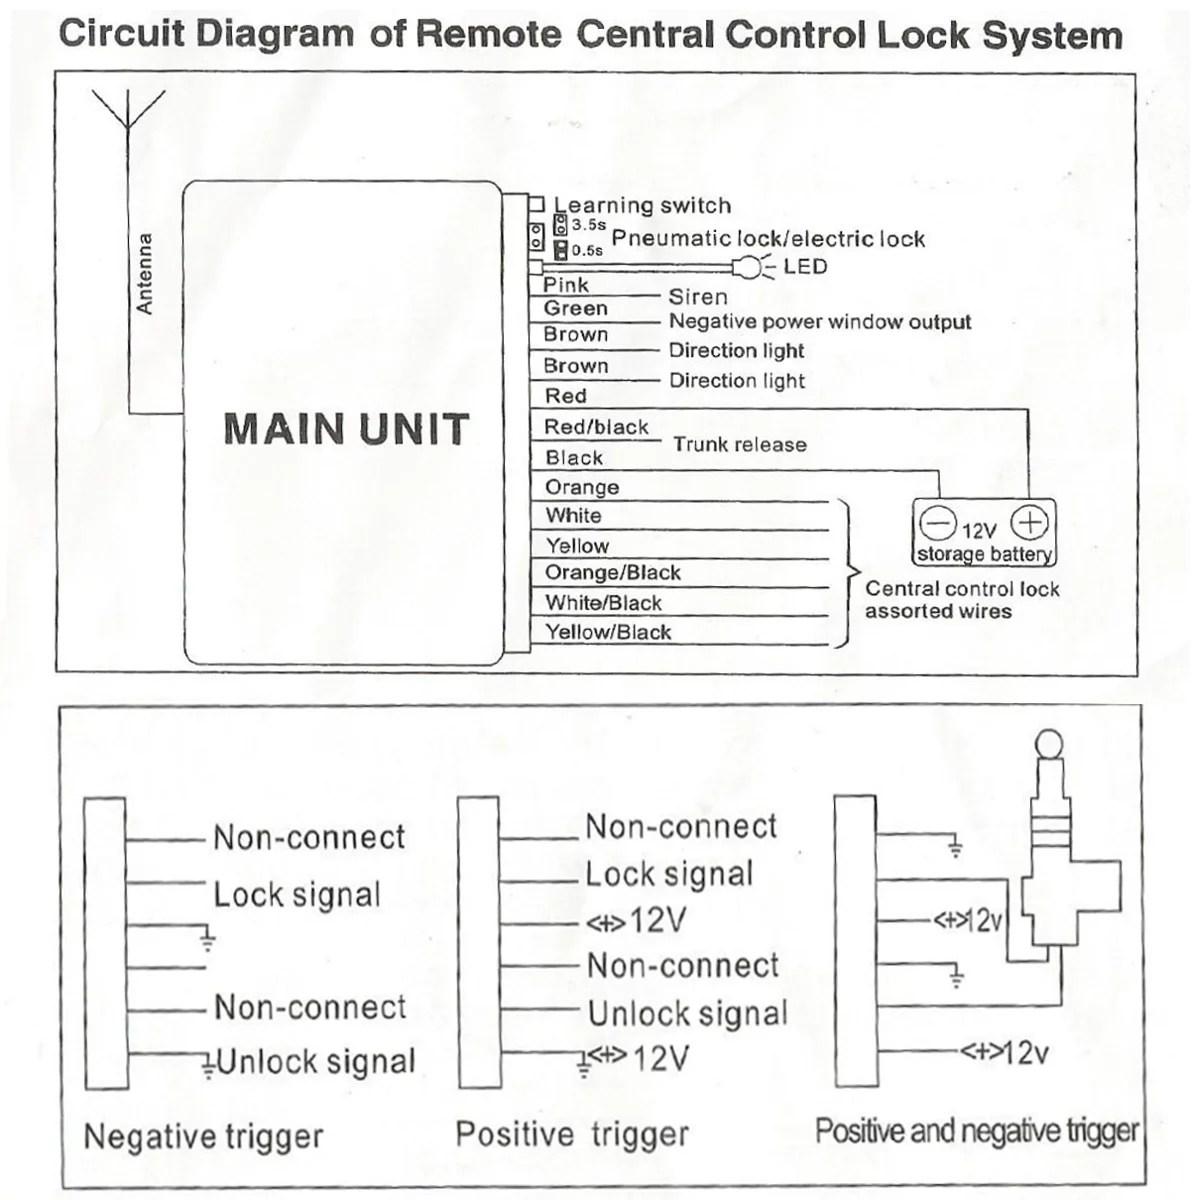 medium resolution of main control unit 2x remotes instructions wiring diagram wiring wiring low voltage under cabinet lighting remote central locking wiring diagram